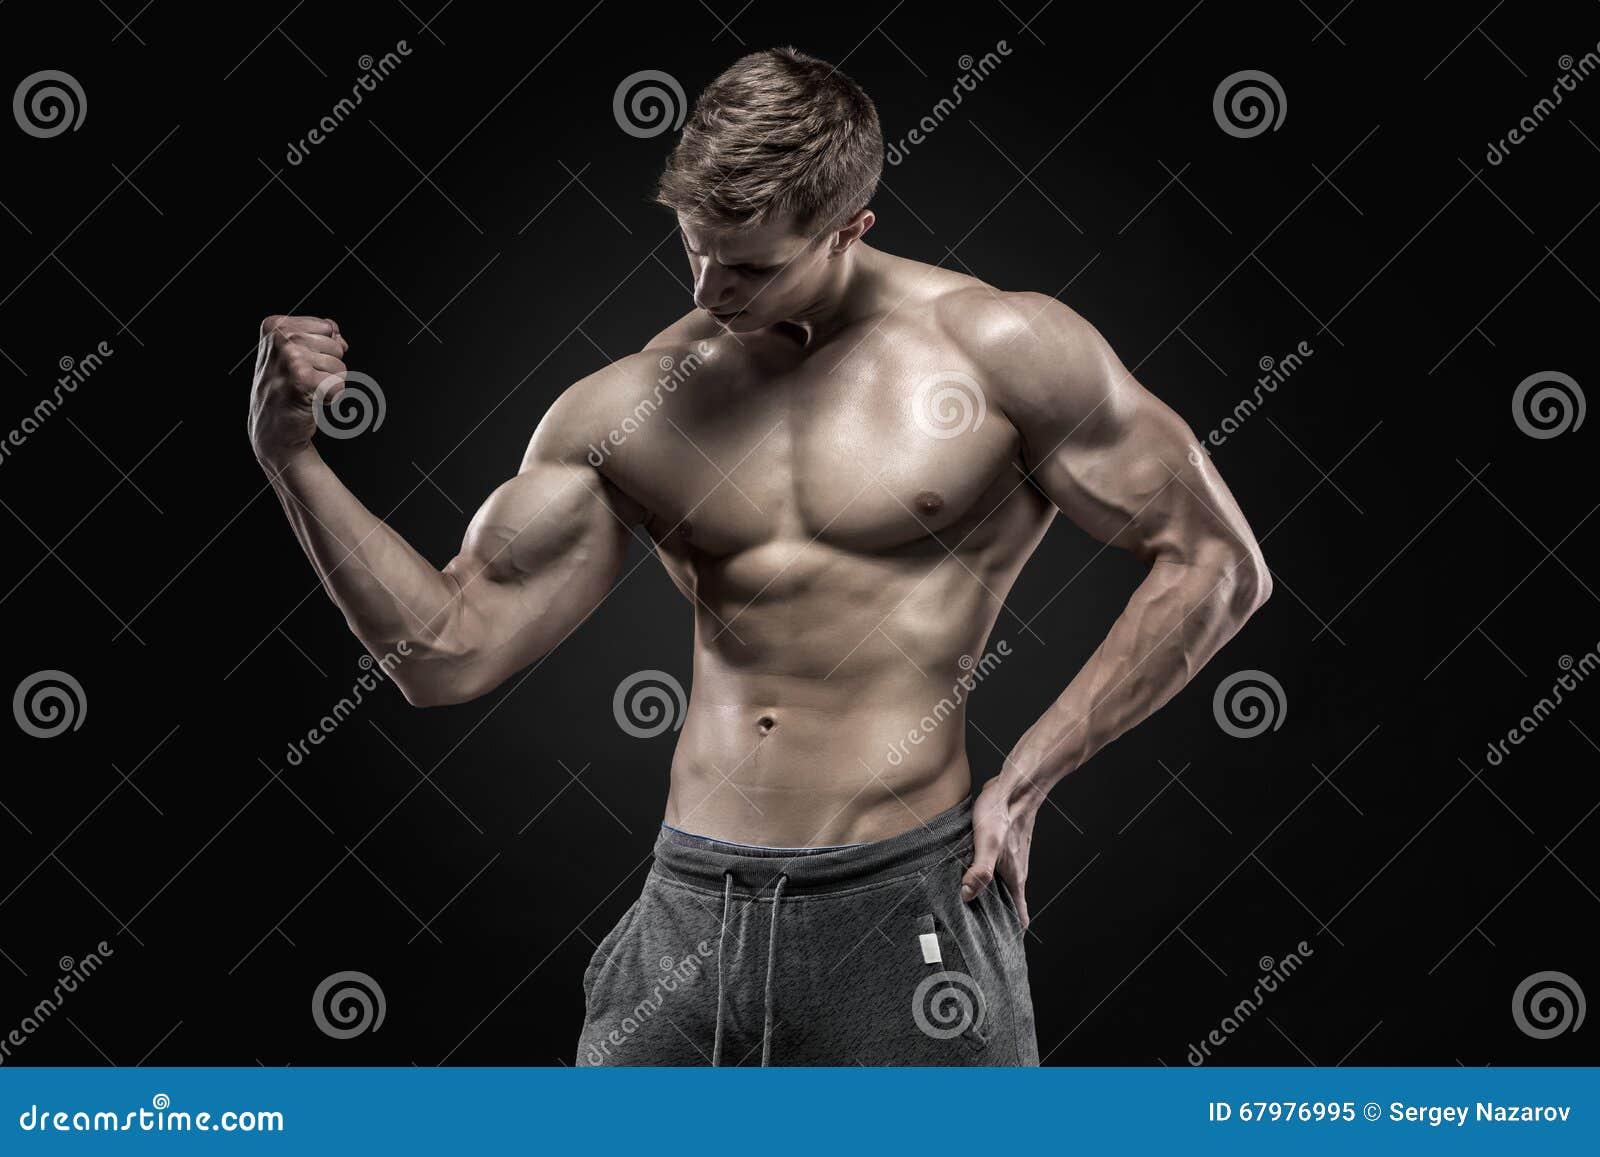 Stunning man vector free photos